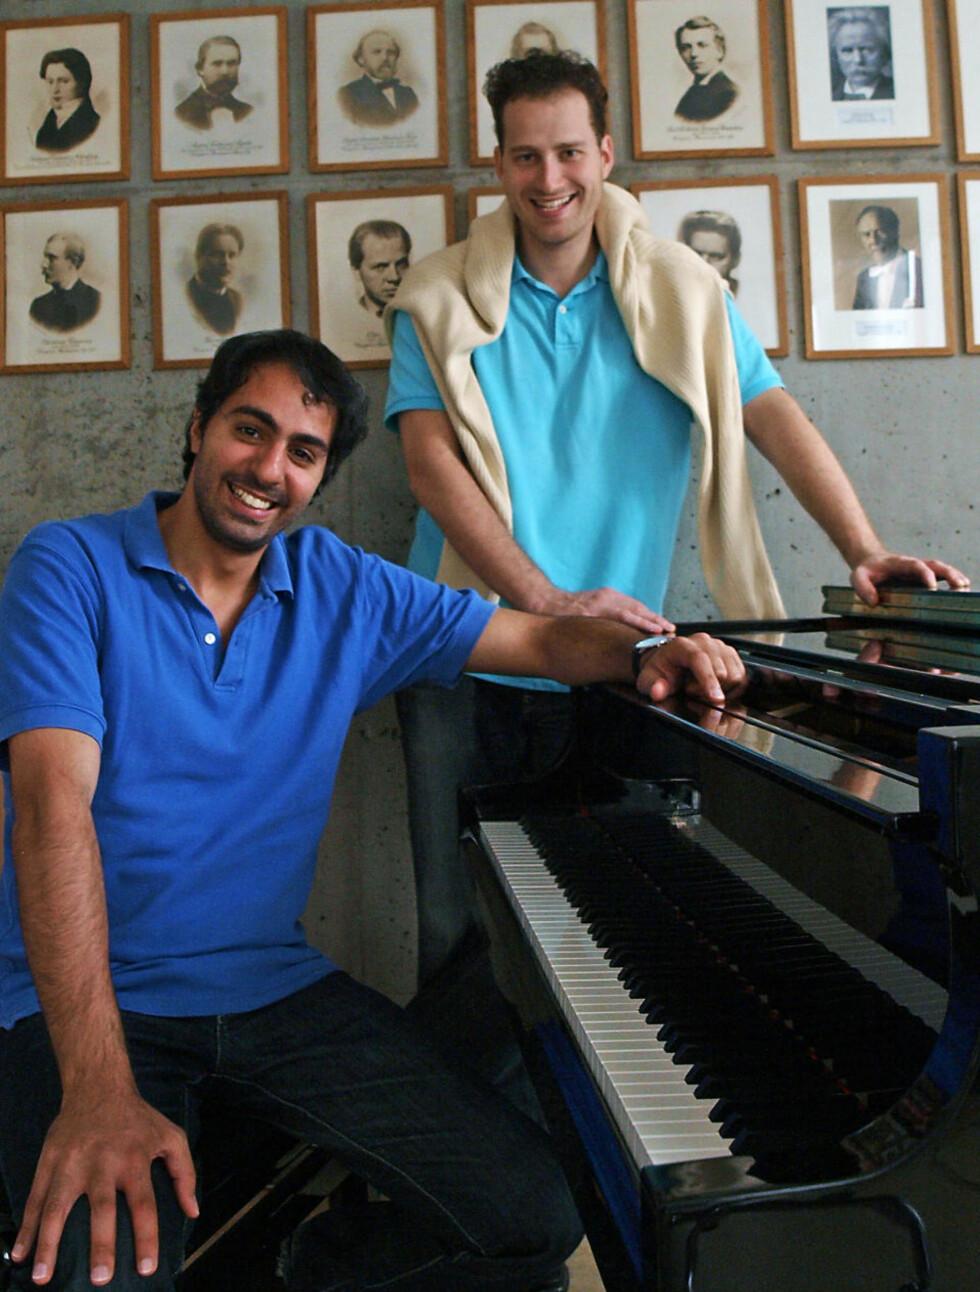 SAMSTEMTE: Nikolaj Znaider (bak) og Saleem Abboud Ashkar er enige om det meste, både musikalsk og i forhold til konflikten mellom Israel og palestinerne. Under Festspillene i Bergen spiller de Schumann med Bergen-Filharmonien, både som solister og dirigenter for hverandre.  Foto: Terje Mosnes